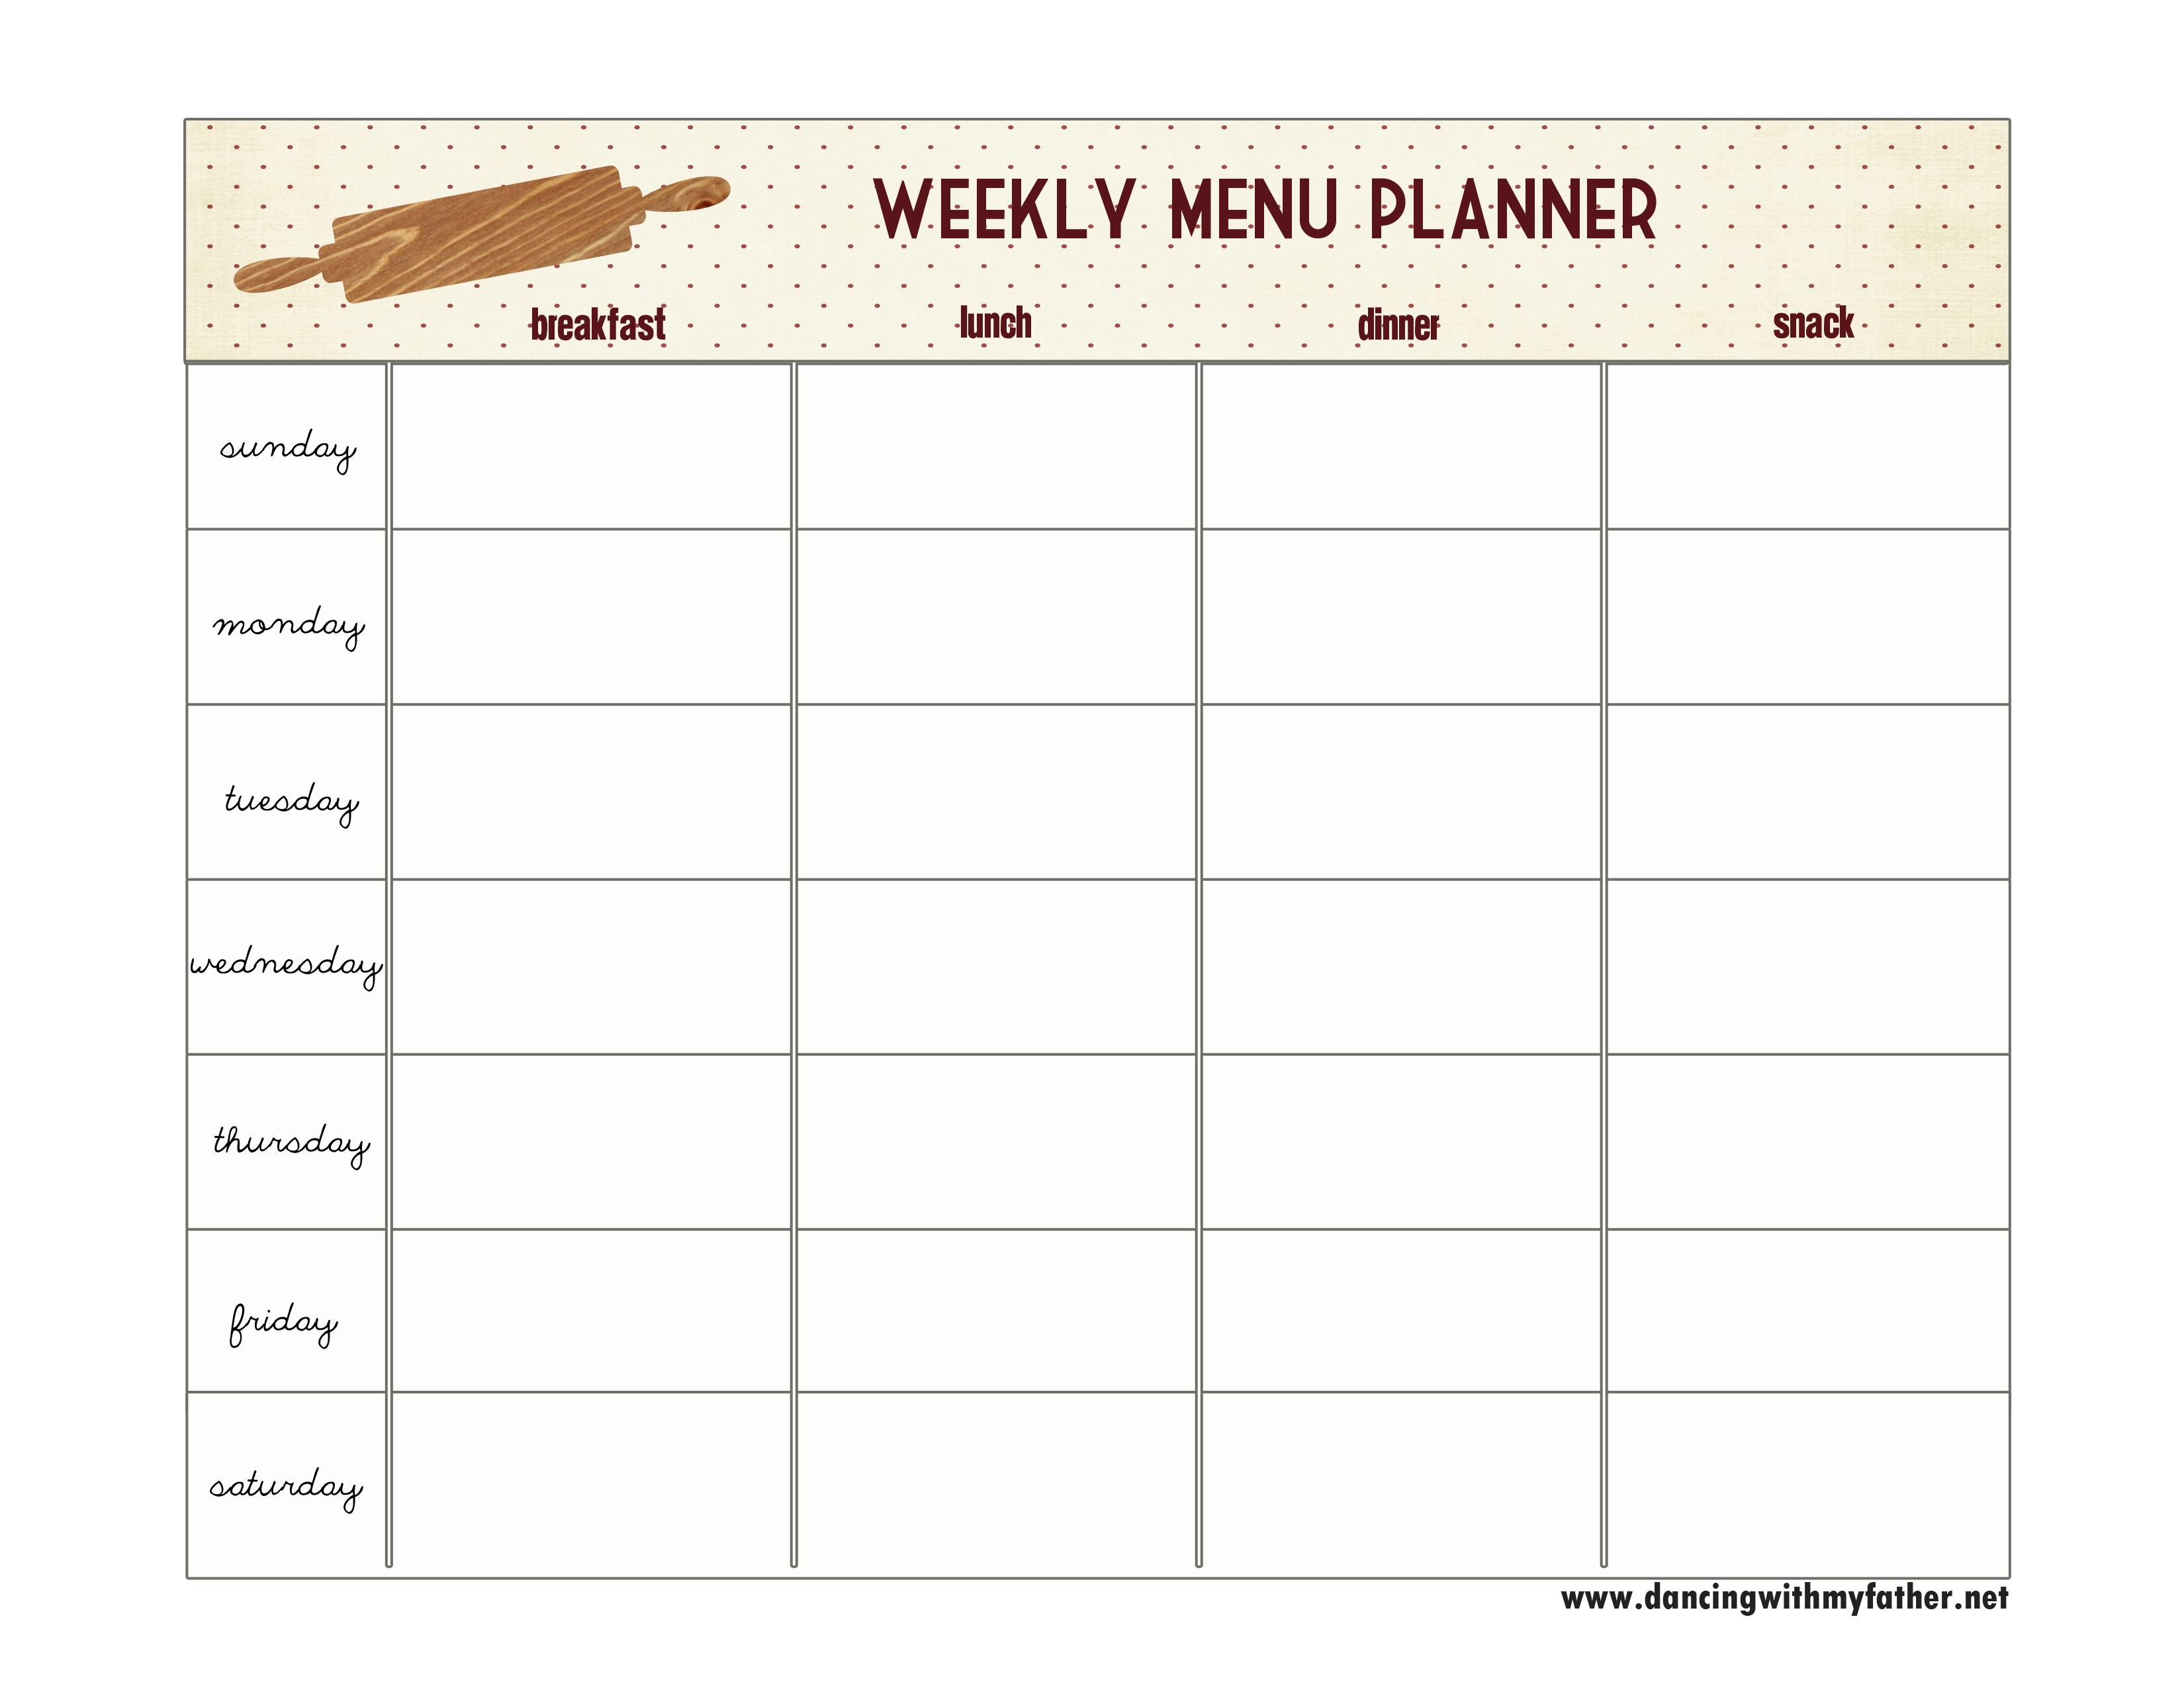 One Step Toward Organized {Free Printable Menu Planner} | Dancing - Free Printable Menu Planner